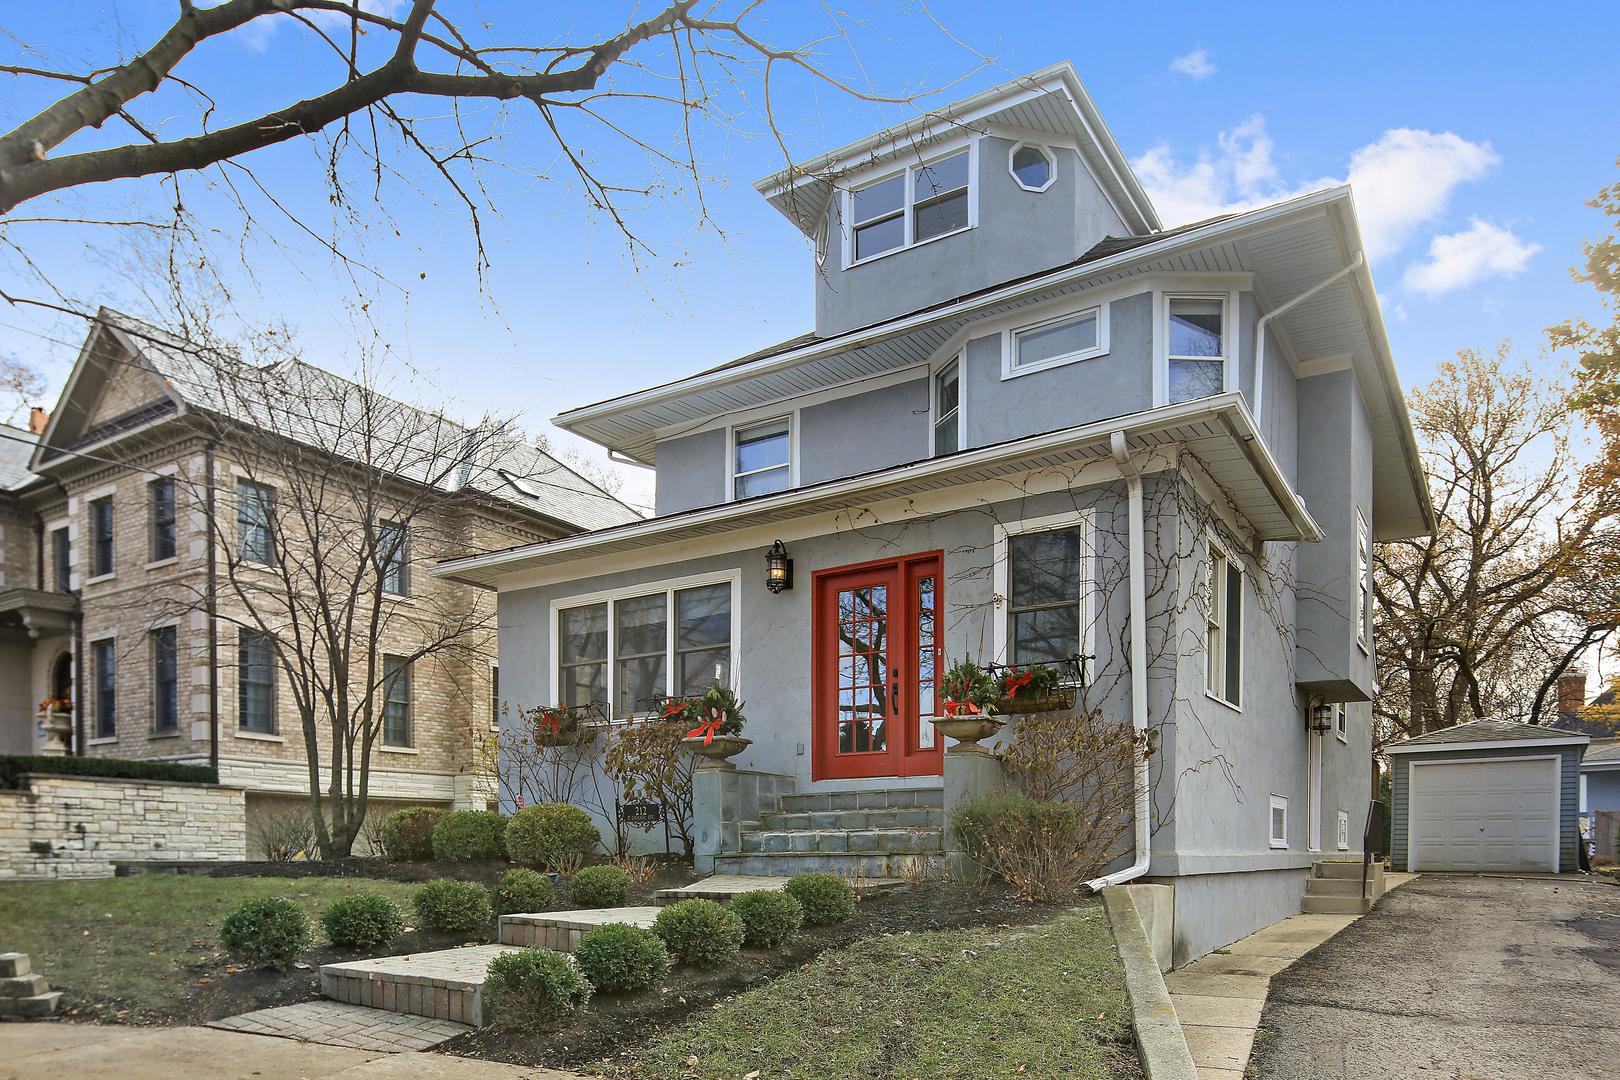 212 East Chicago Avenue, Hinsdale, Illinois 60521